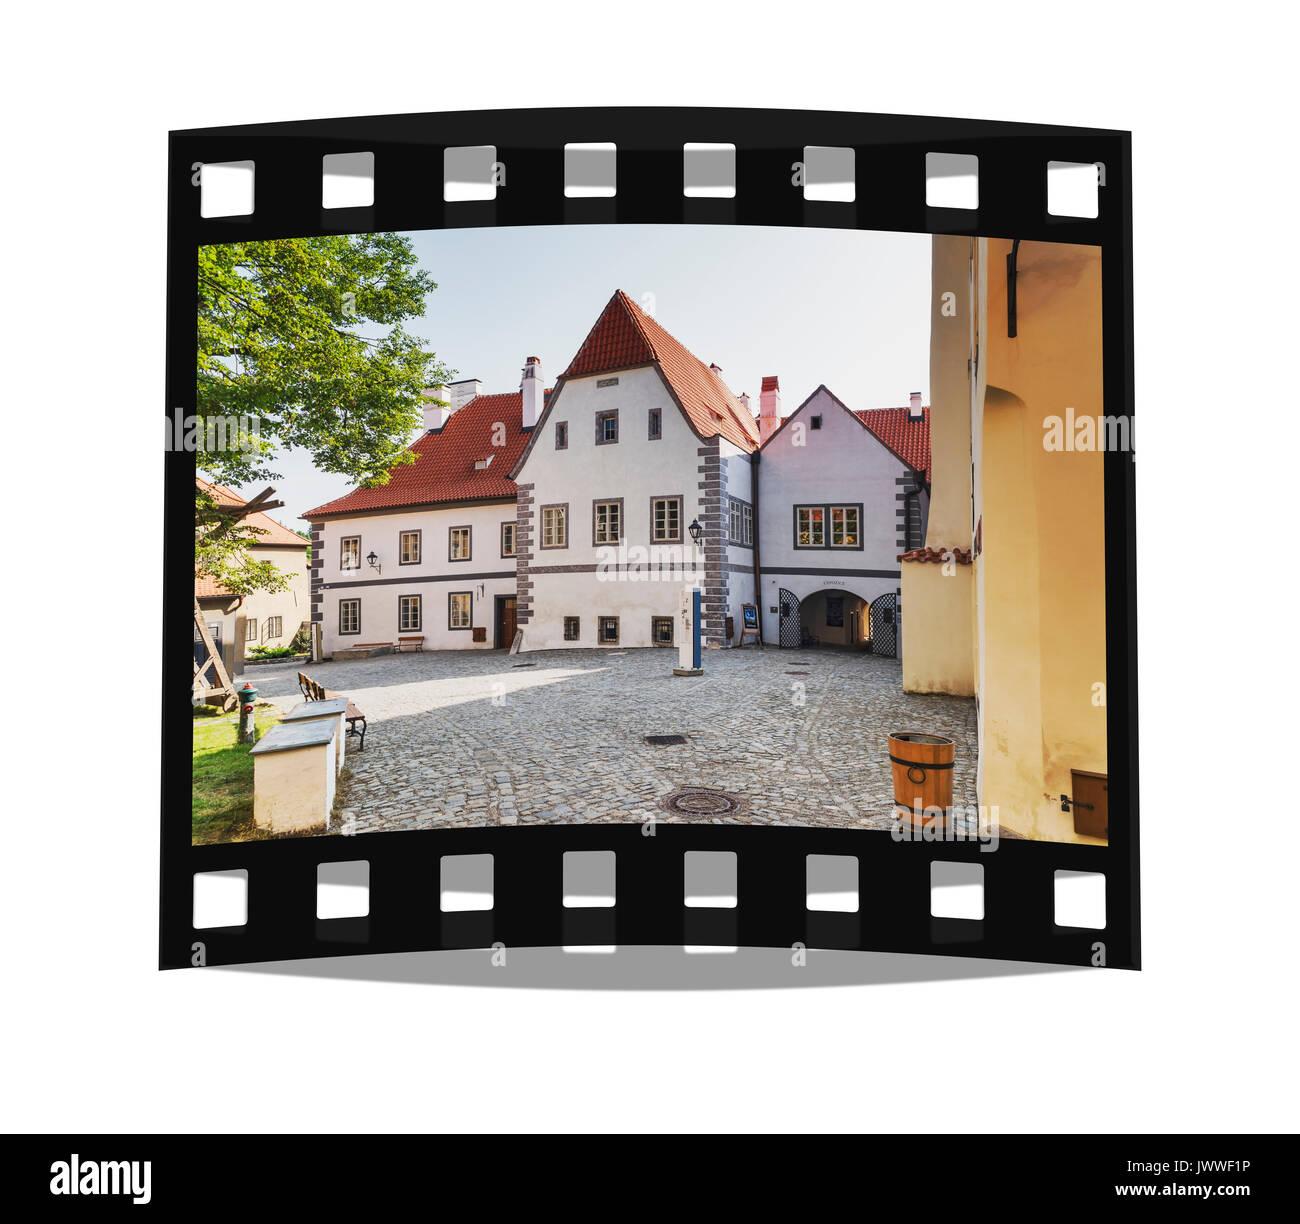 The Monastery courtyard is located in the town of Cesky Krumlov on the Vltava River in Bohemia, Jihocesky kraj, Czech Republic, Europe - Stock Image